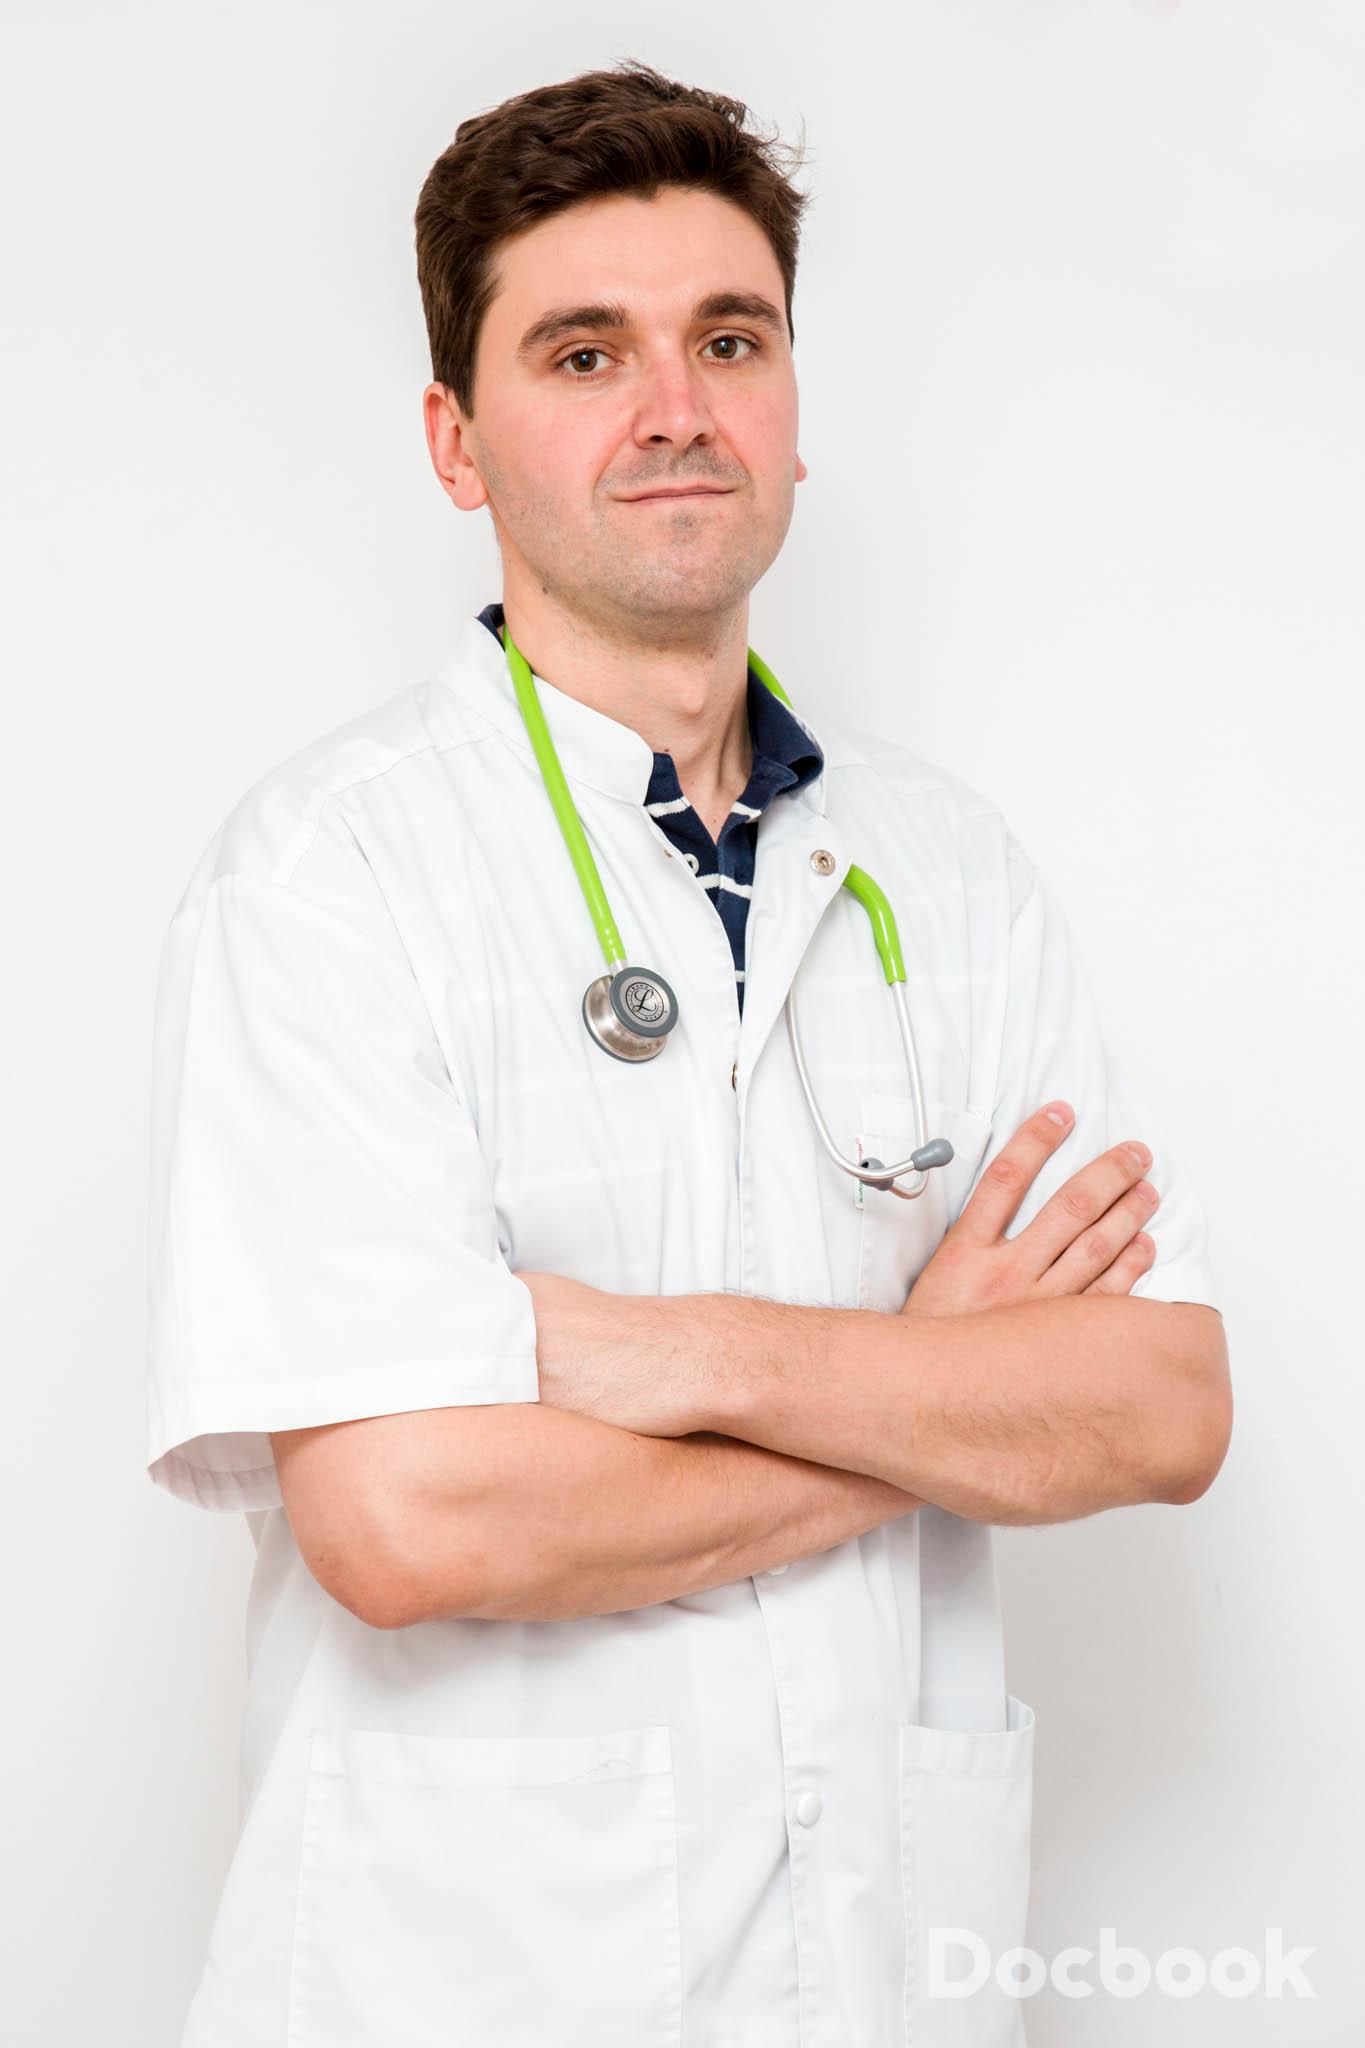 Dr. Radu Brezeanu